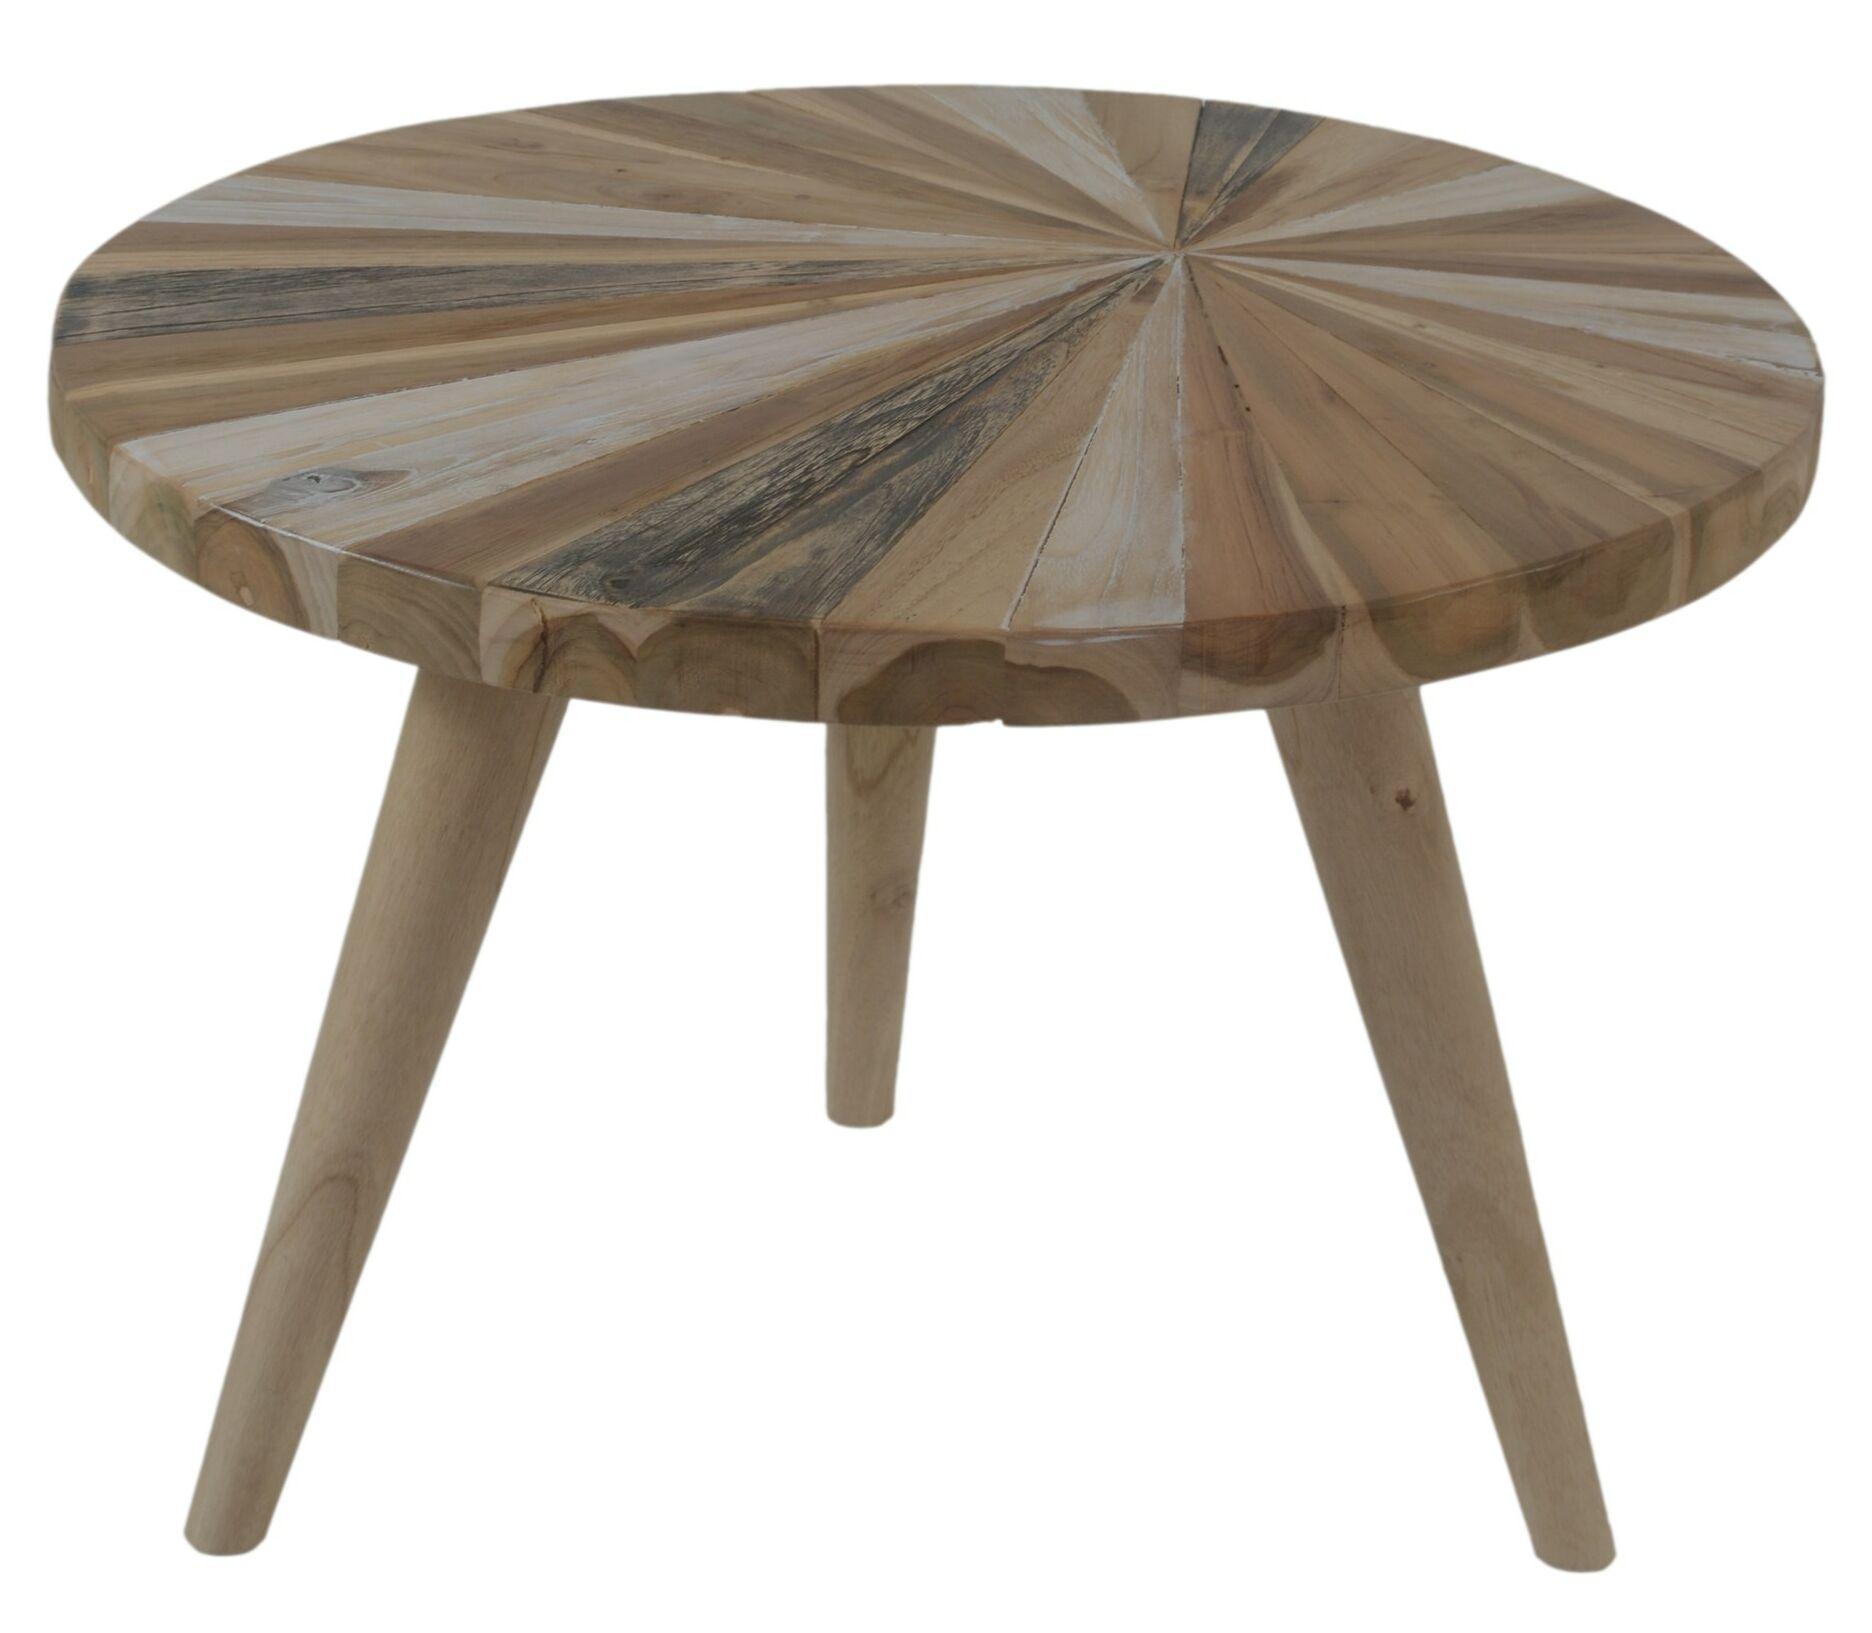 Sherita Wood End Table